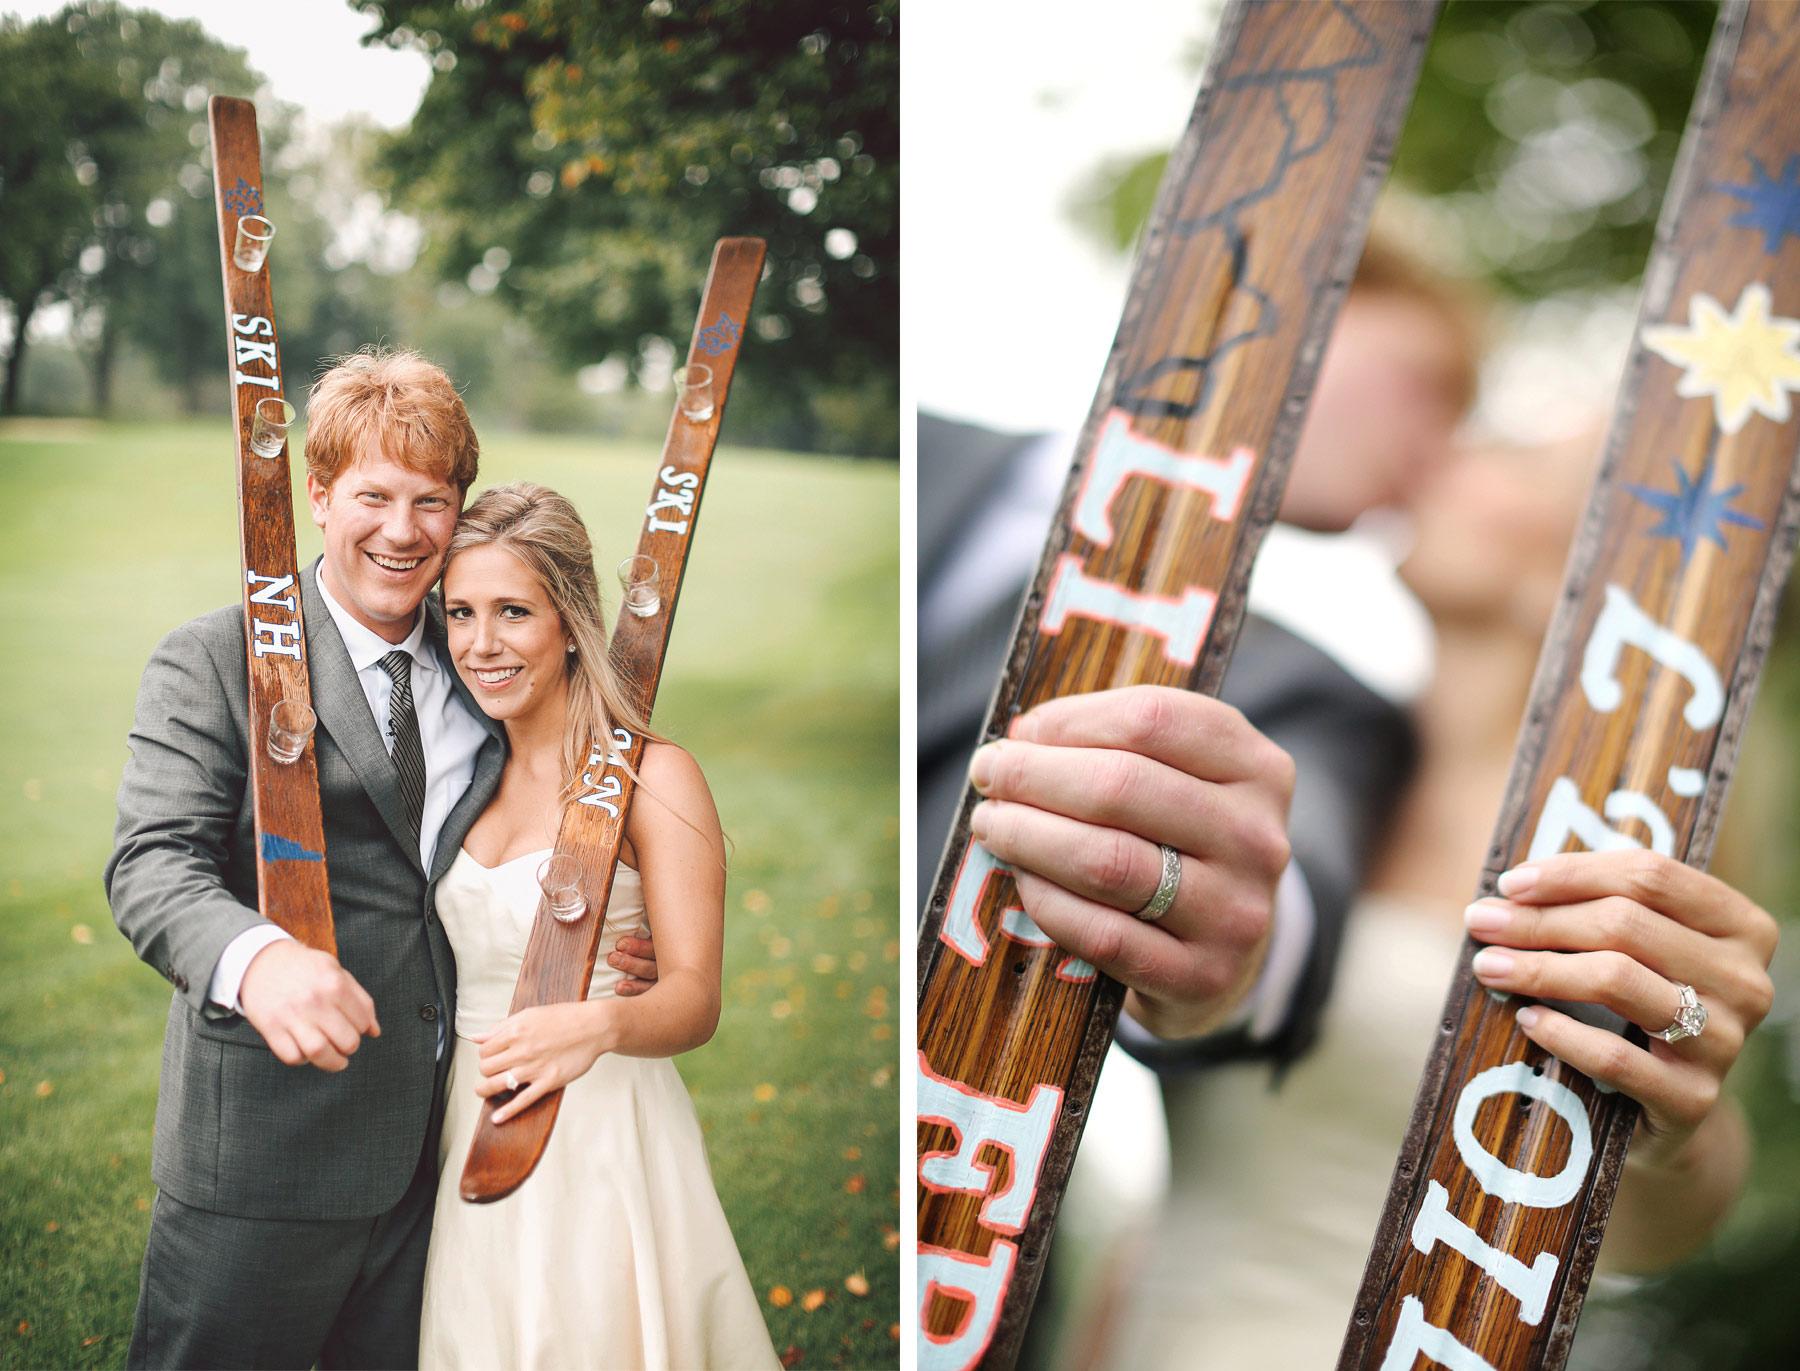 19-Minneapolis-Minnesota-Wedding-Photographer-by-Andrew-Vick-Photography-Fall-Autumn-Minikahda-Club-Bride-Groom-Shot-Ski-Rings-Golf-Course-Vintage-Krissy-and-James.jpg